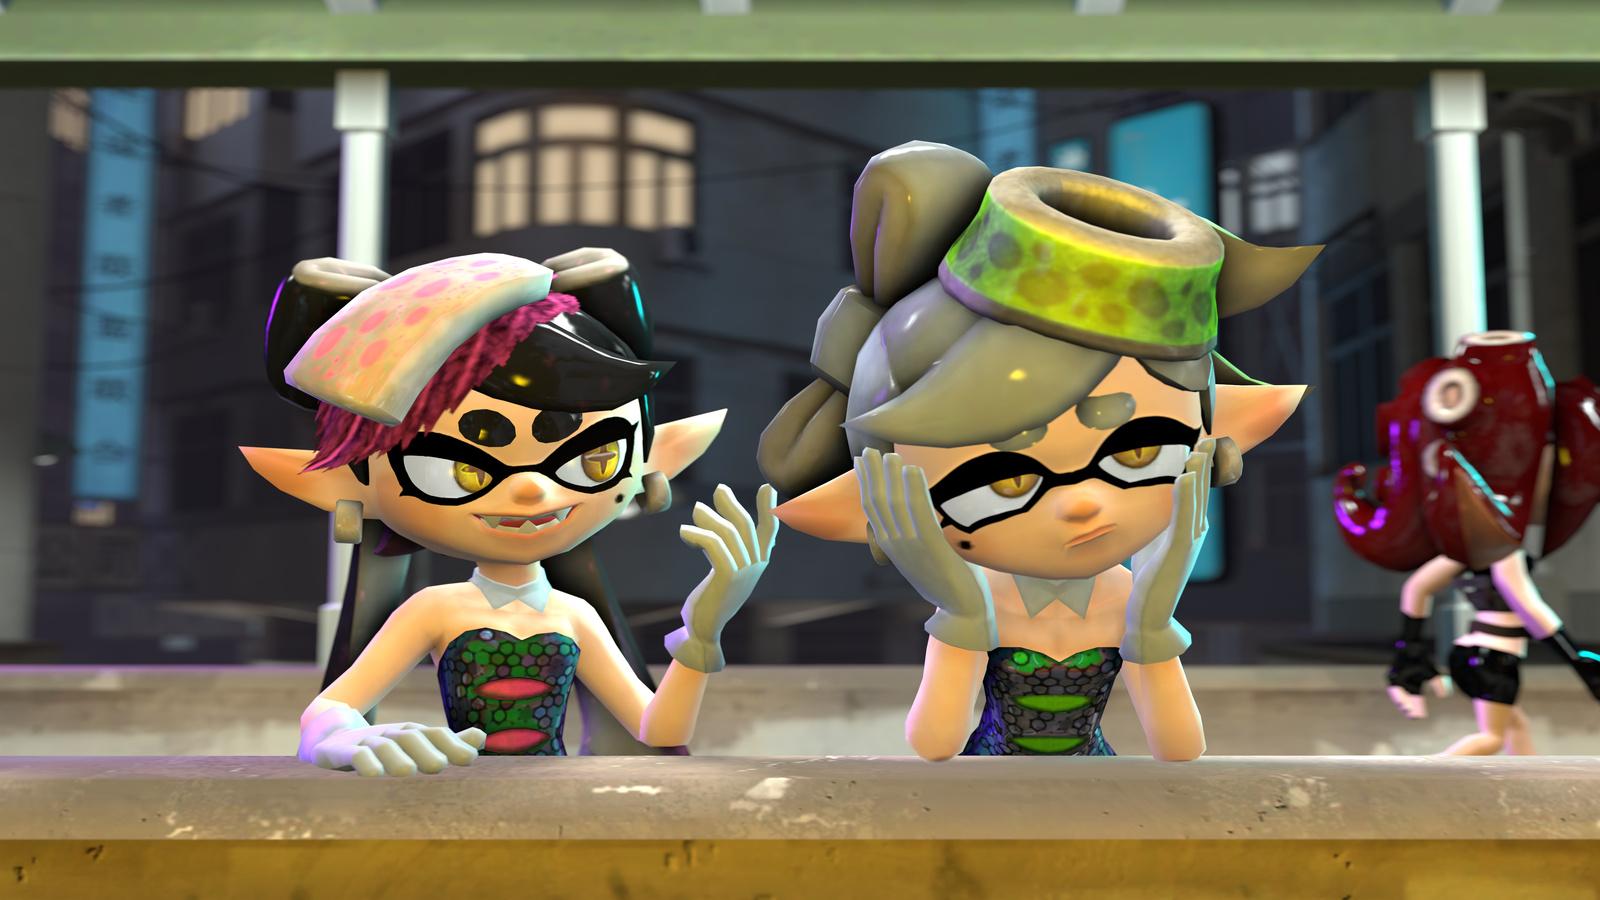 Splatoon 2 Squid Sisters Story Deepens In Chapter 2 Nintendo Life